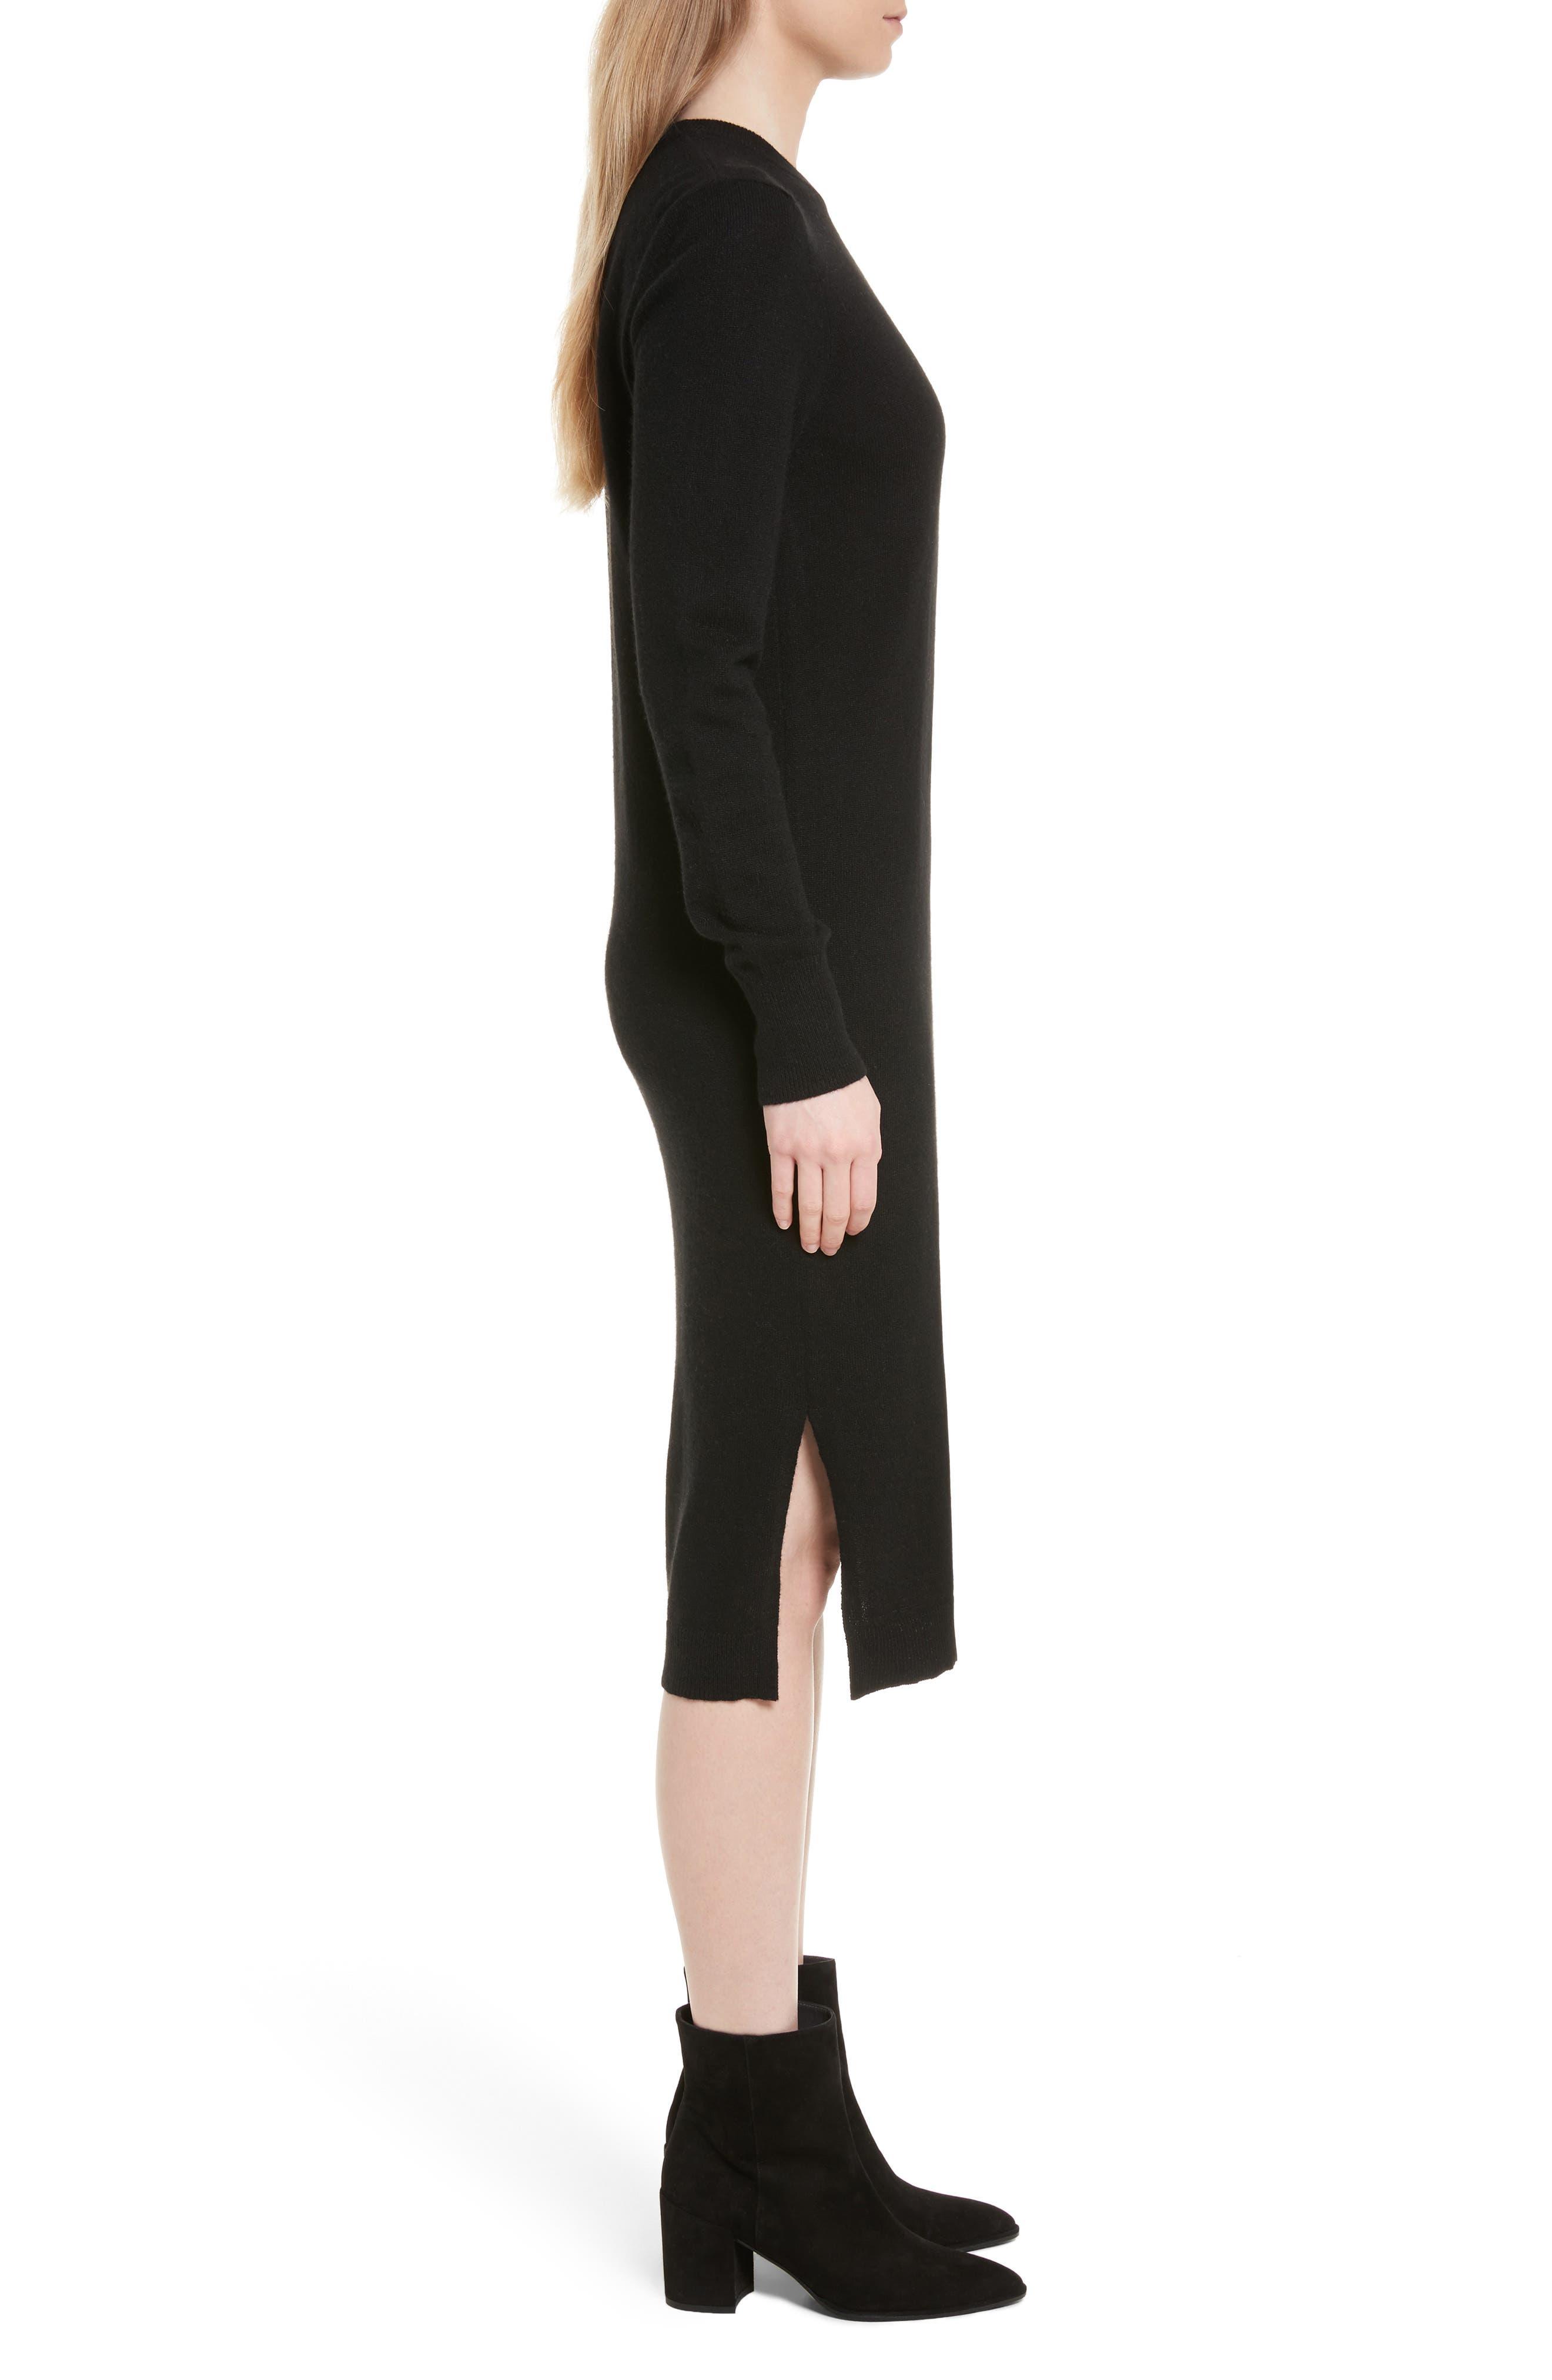 Snyder Cashmere Knit Midi Dress,                             Alternate thumbnail 3, color,                             001